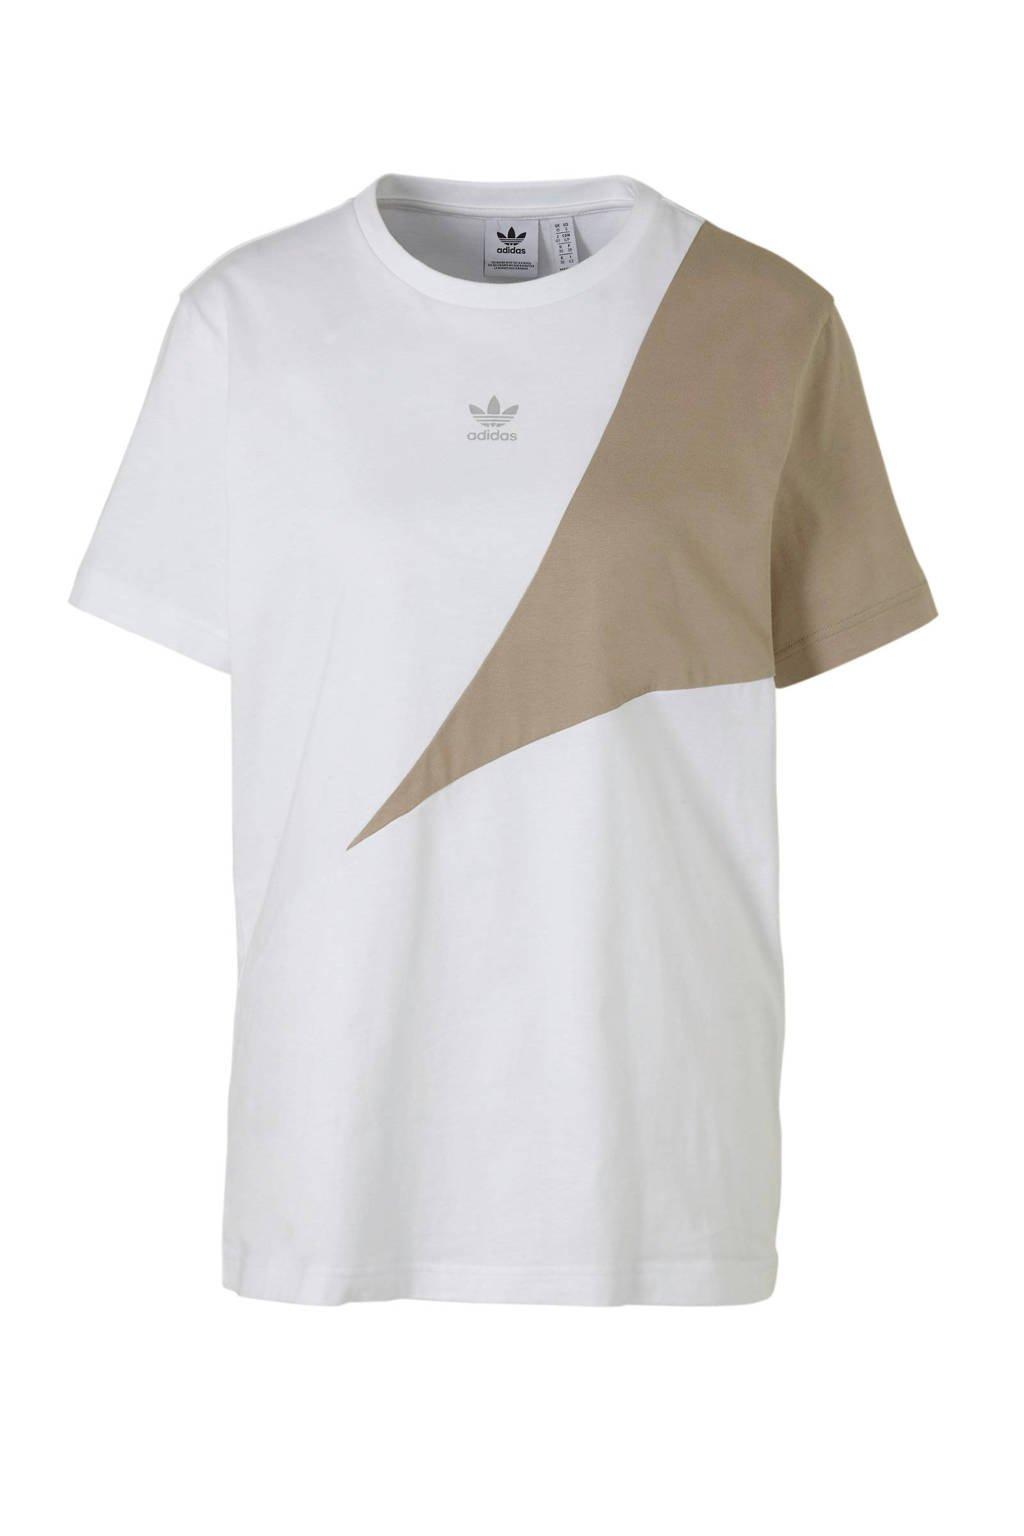 adidas originals T-shirt wit/kaki, Wit/kaki